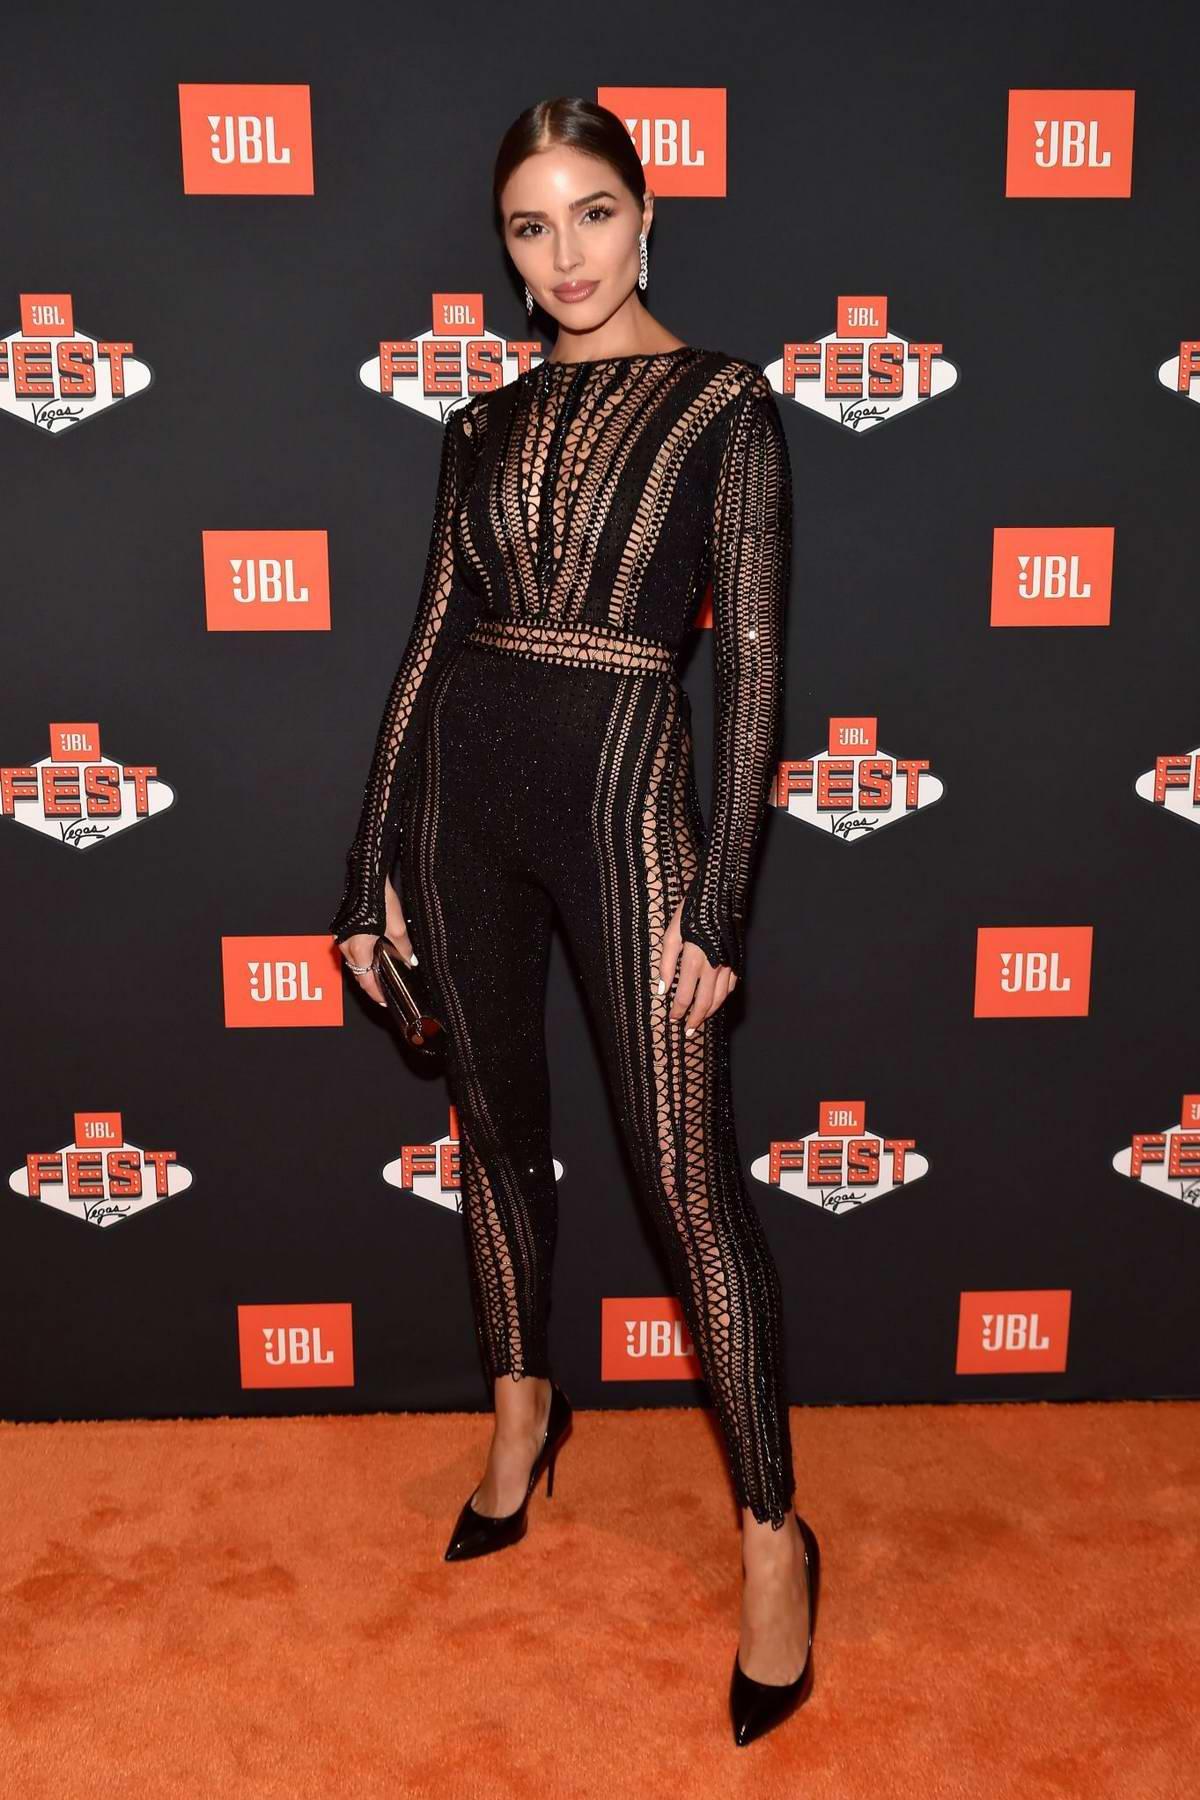 Olivia Culpo at the JBL Fest 2018 at Caesars Palace in Las Vegas, Nevada